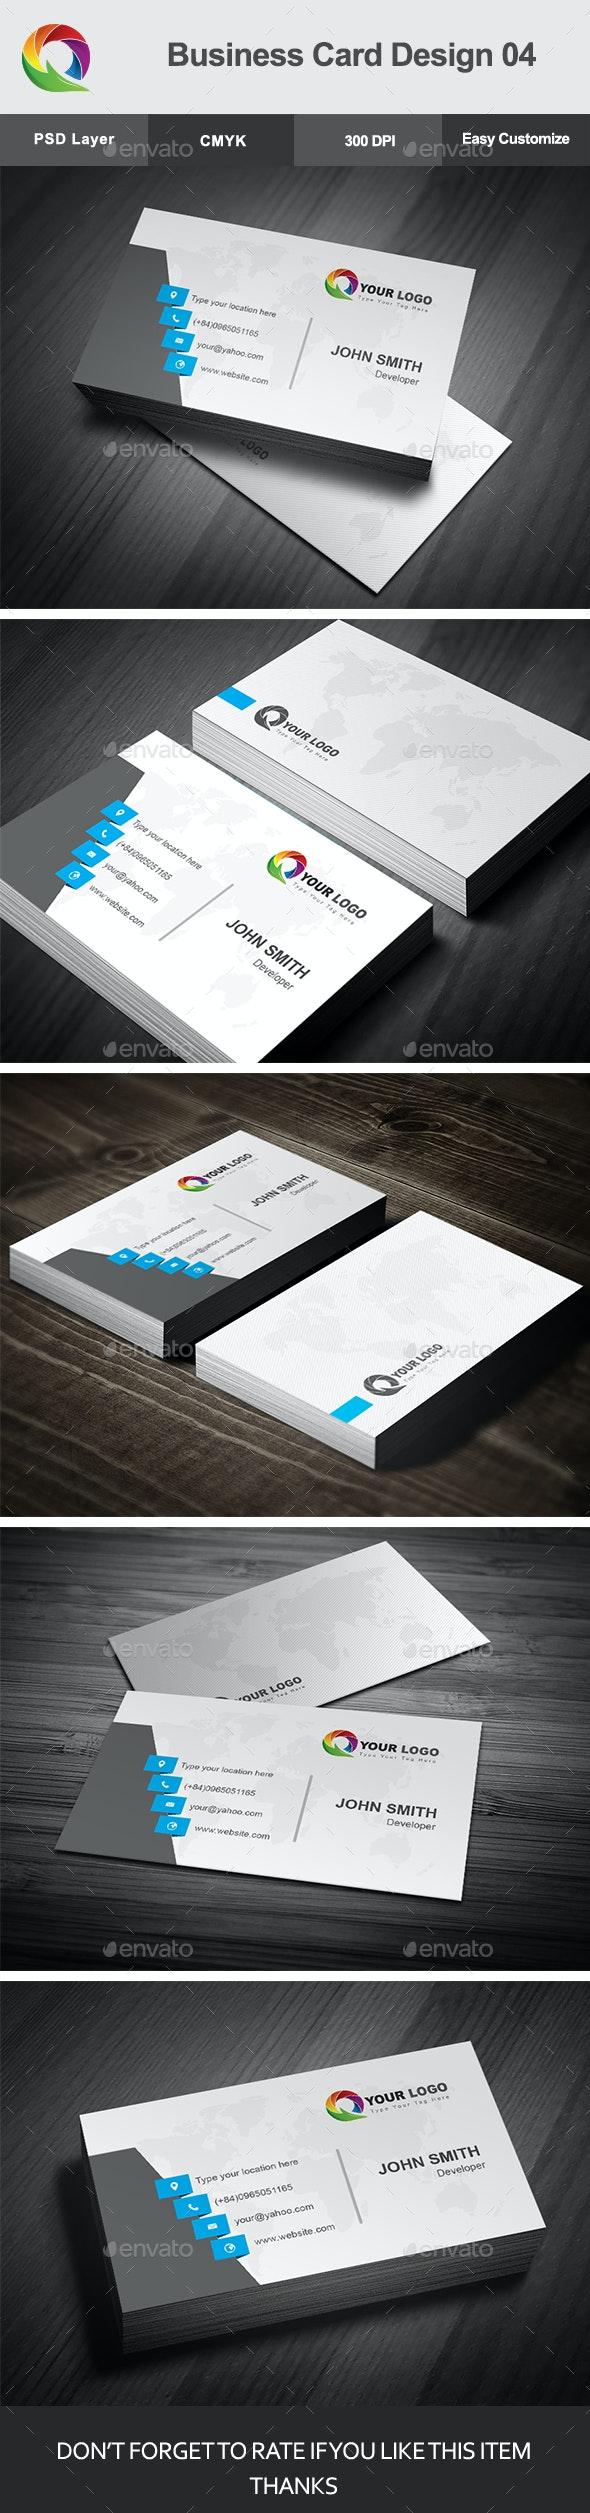 Business Card Design 04 - Corporate Business Cards